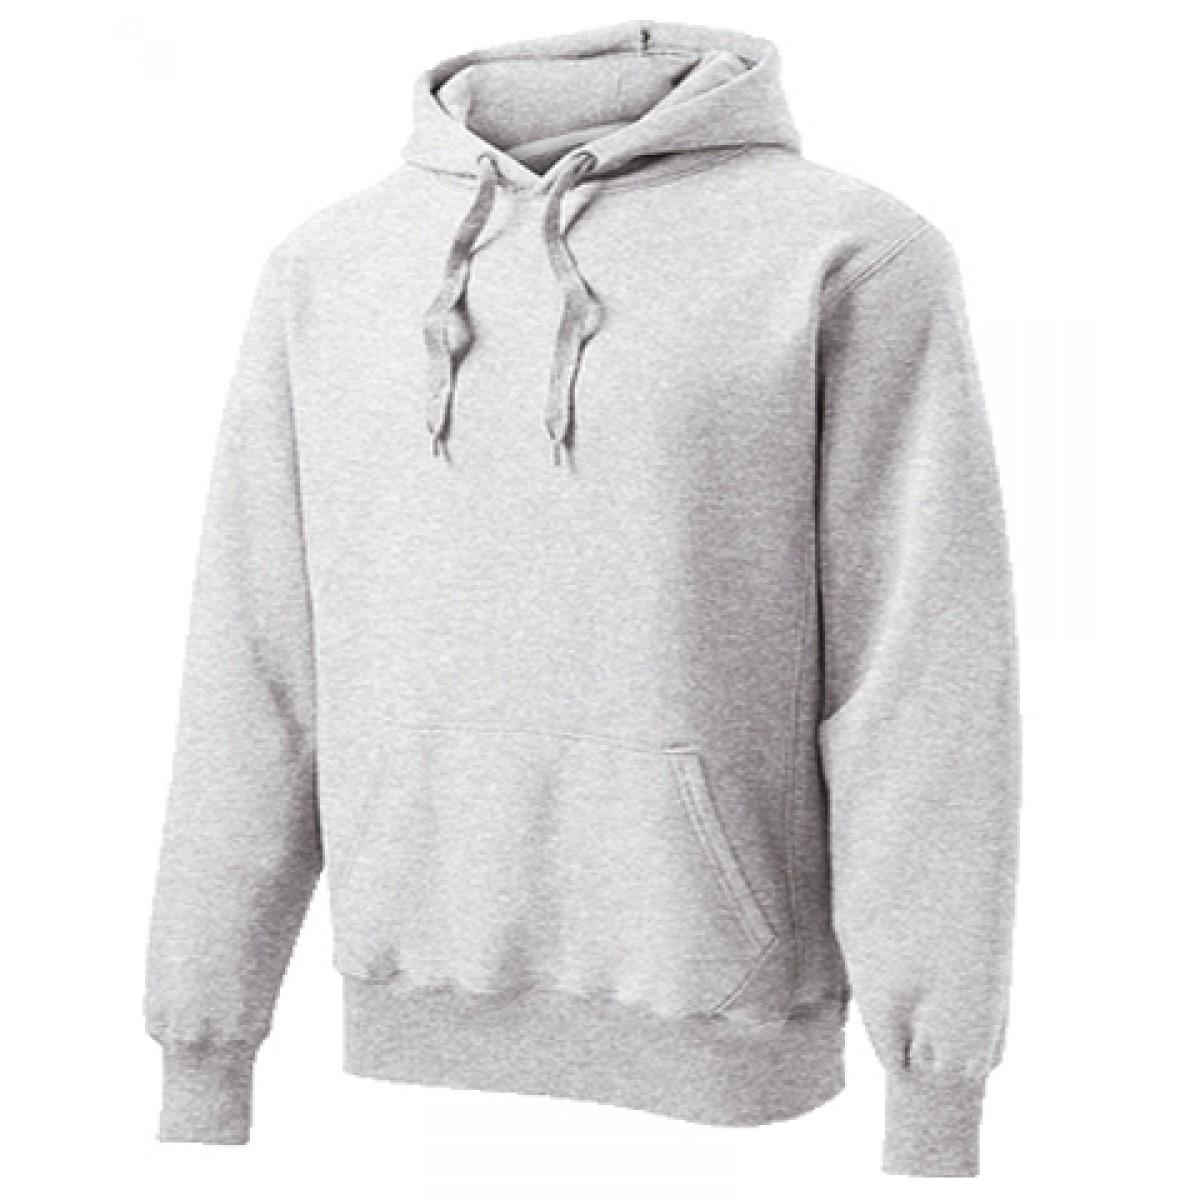 Hooded Sweatshirt 50/50 Heavy Blend Gray-Gray -2XL